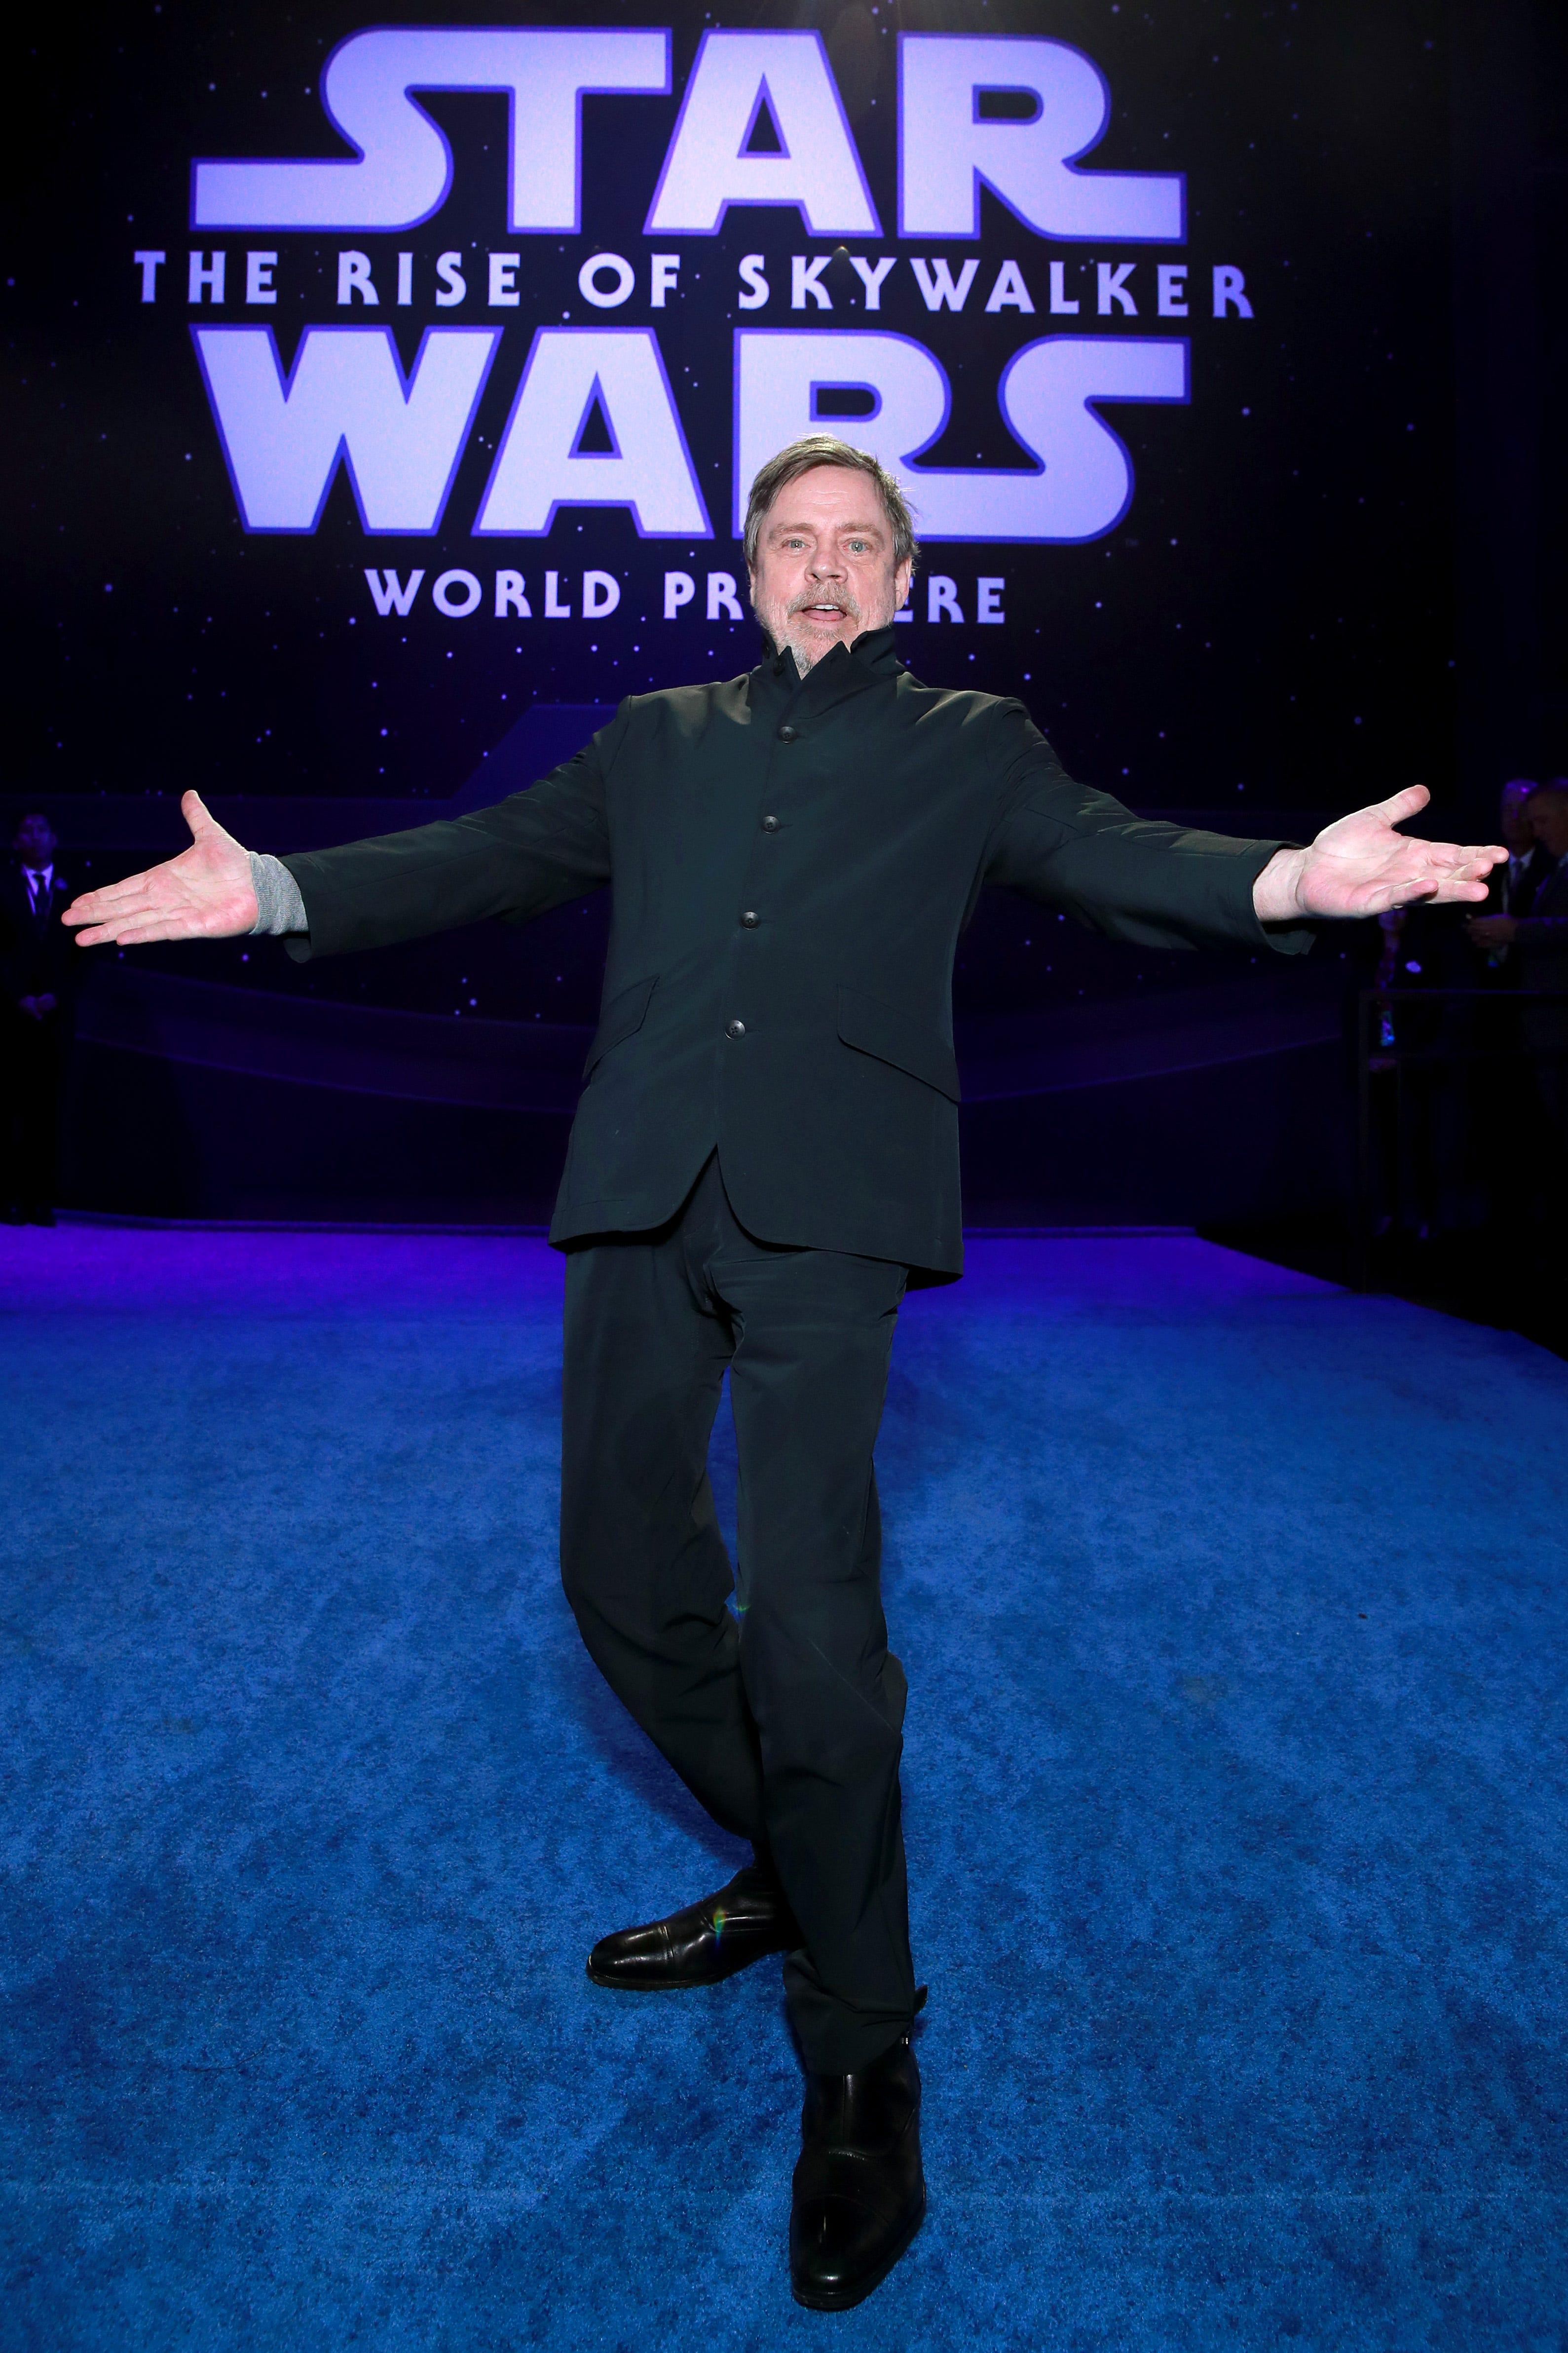 Star Wars star Mark Hamill quits Facebook, accuses Mark Zuckerberg of putting profits over  truthfulness